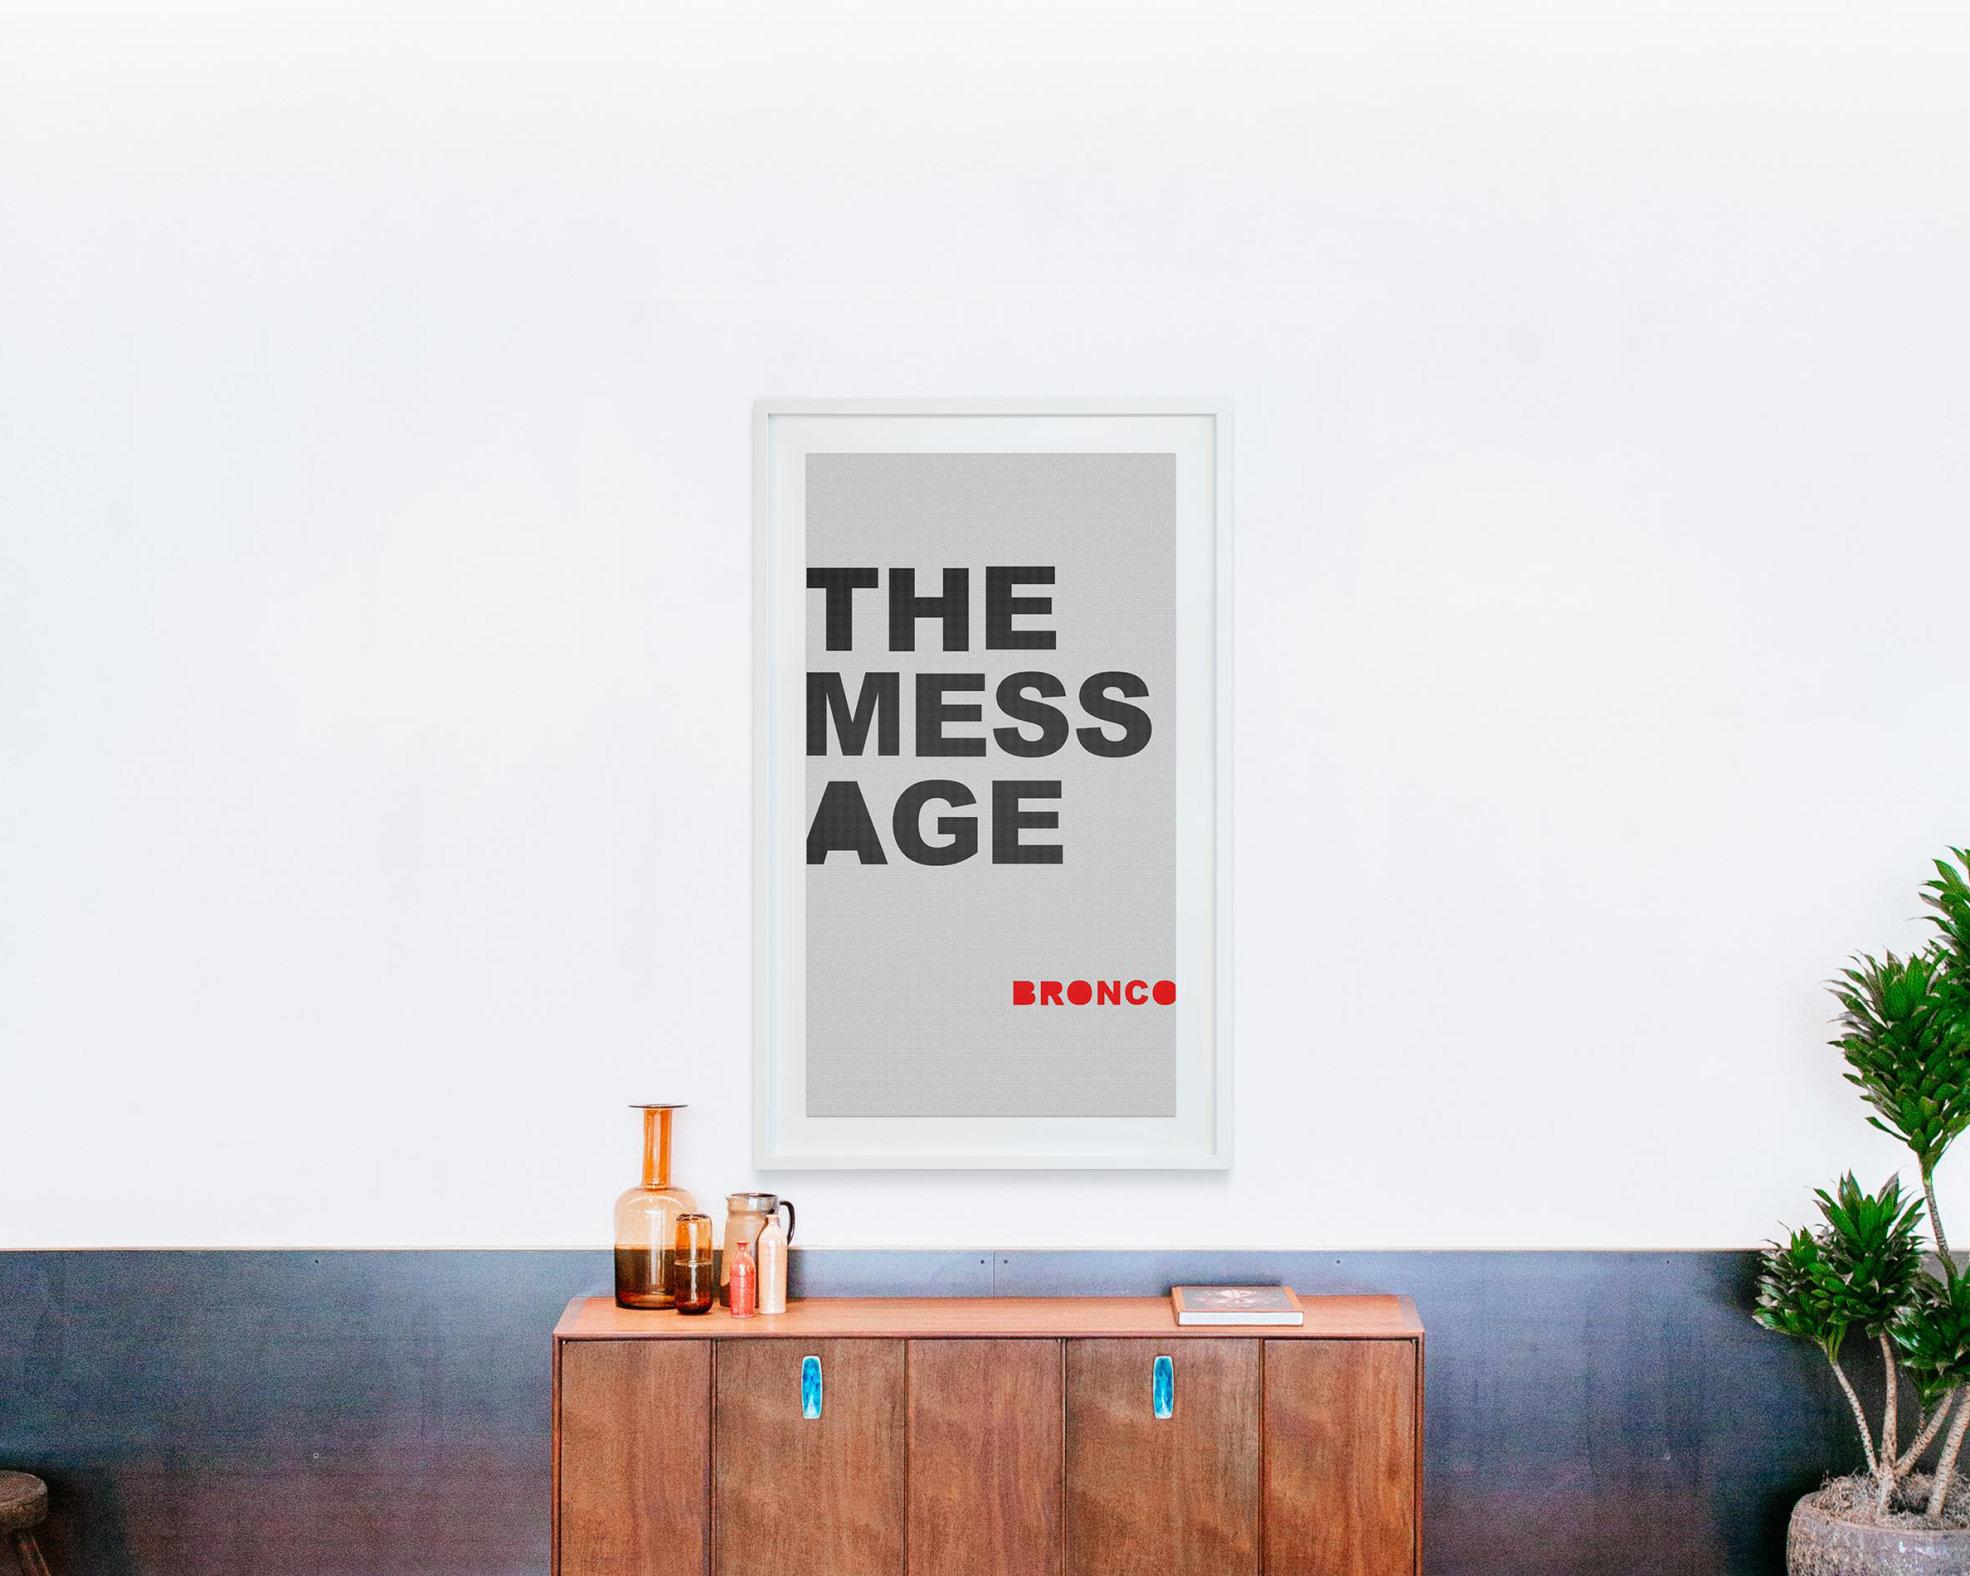 BRONCO, The Mess Age